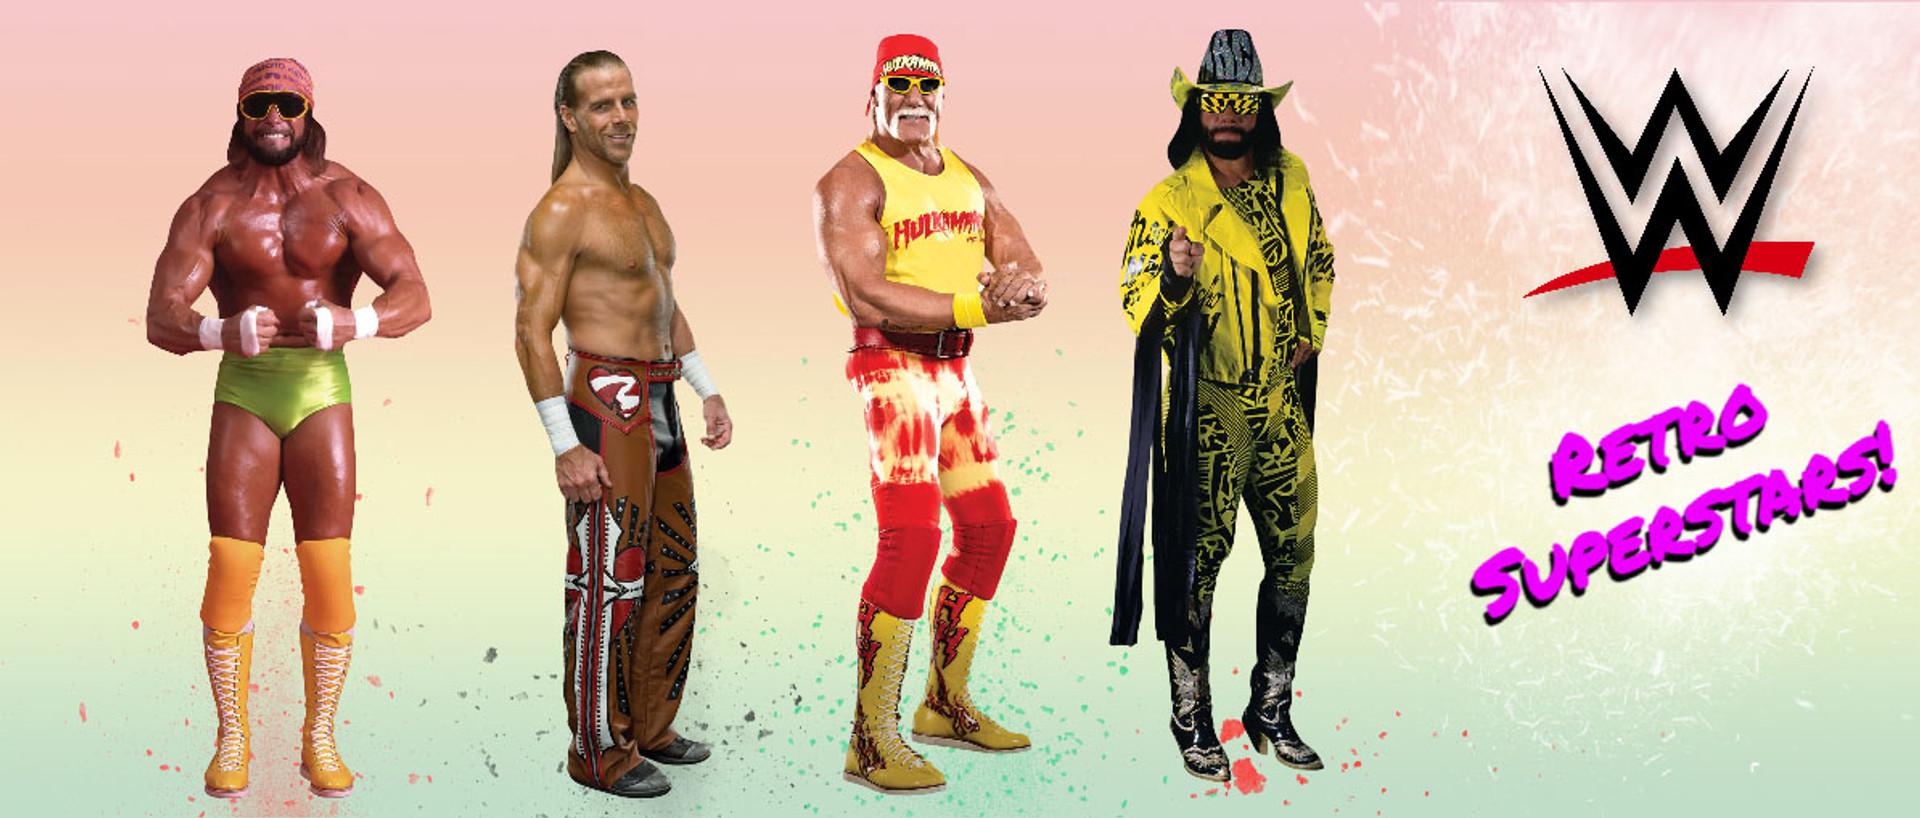 WWE Cardboard Cutouts of Retro Superstars